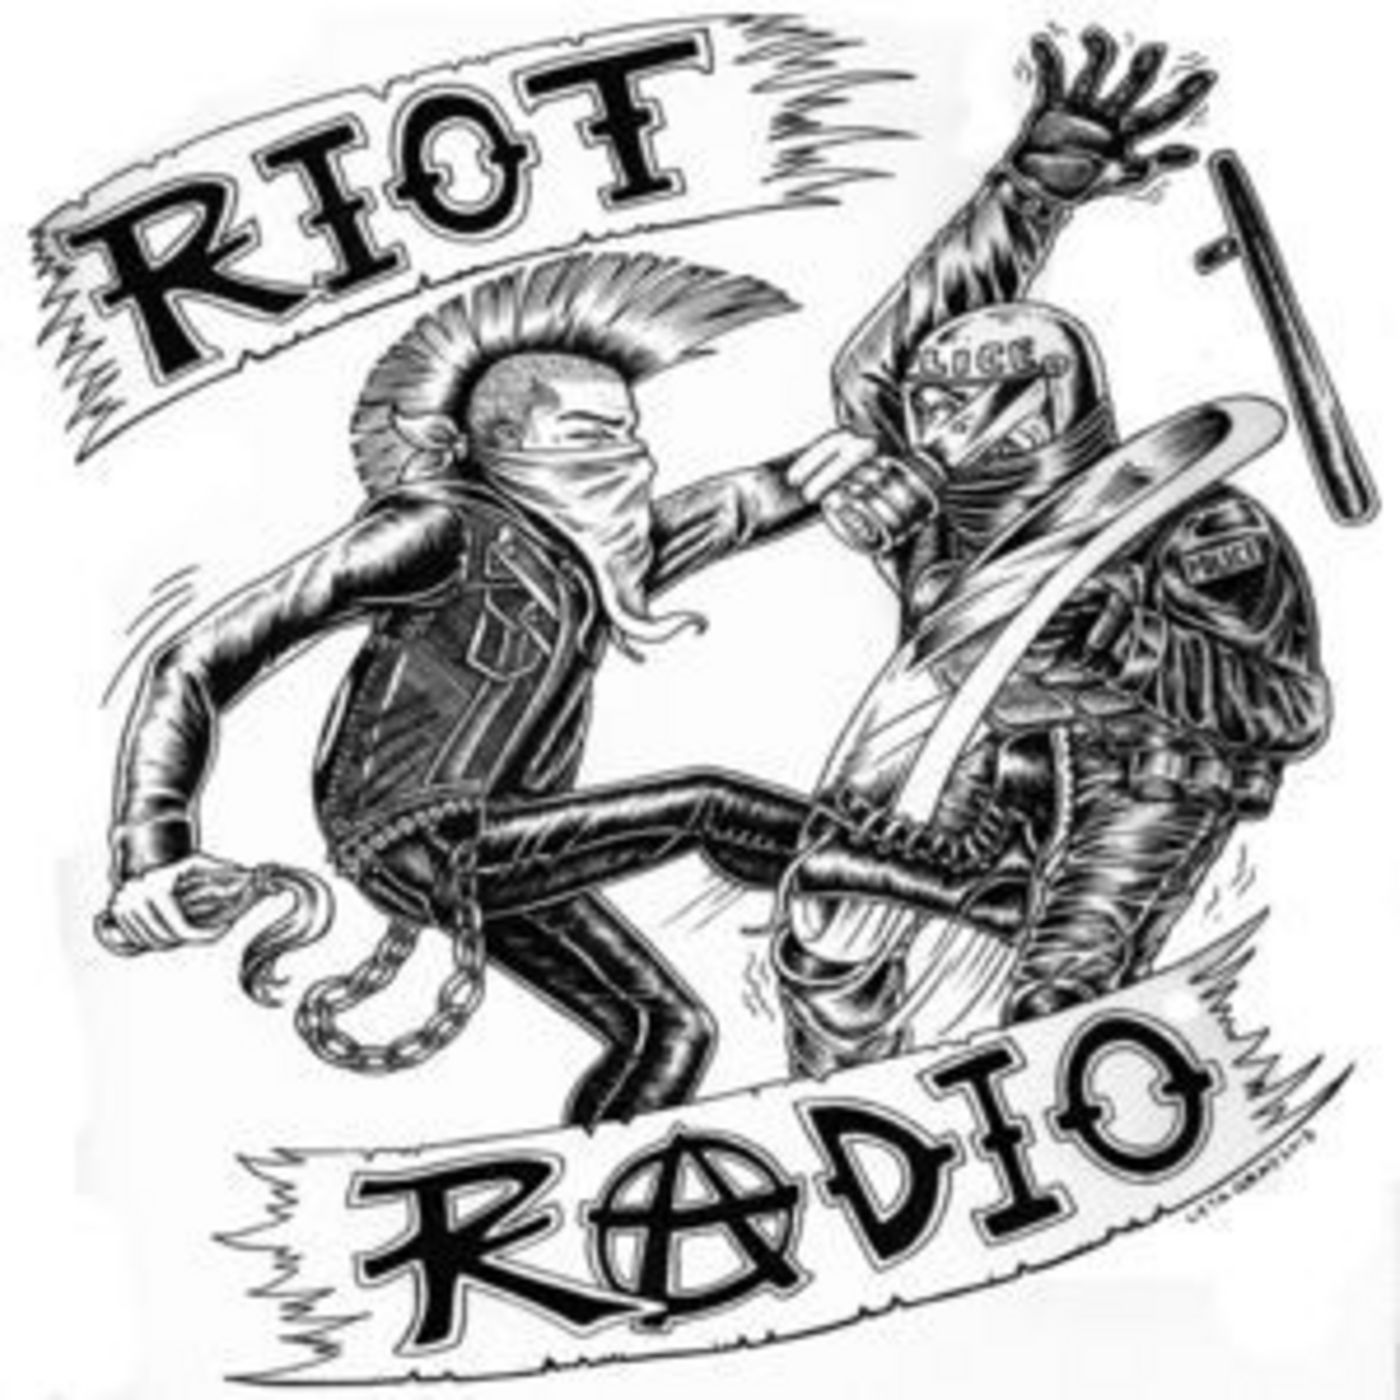 <![CDATA[Riot Radio]]>